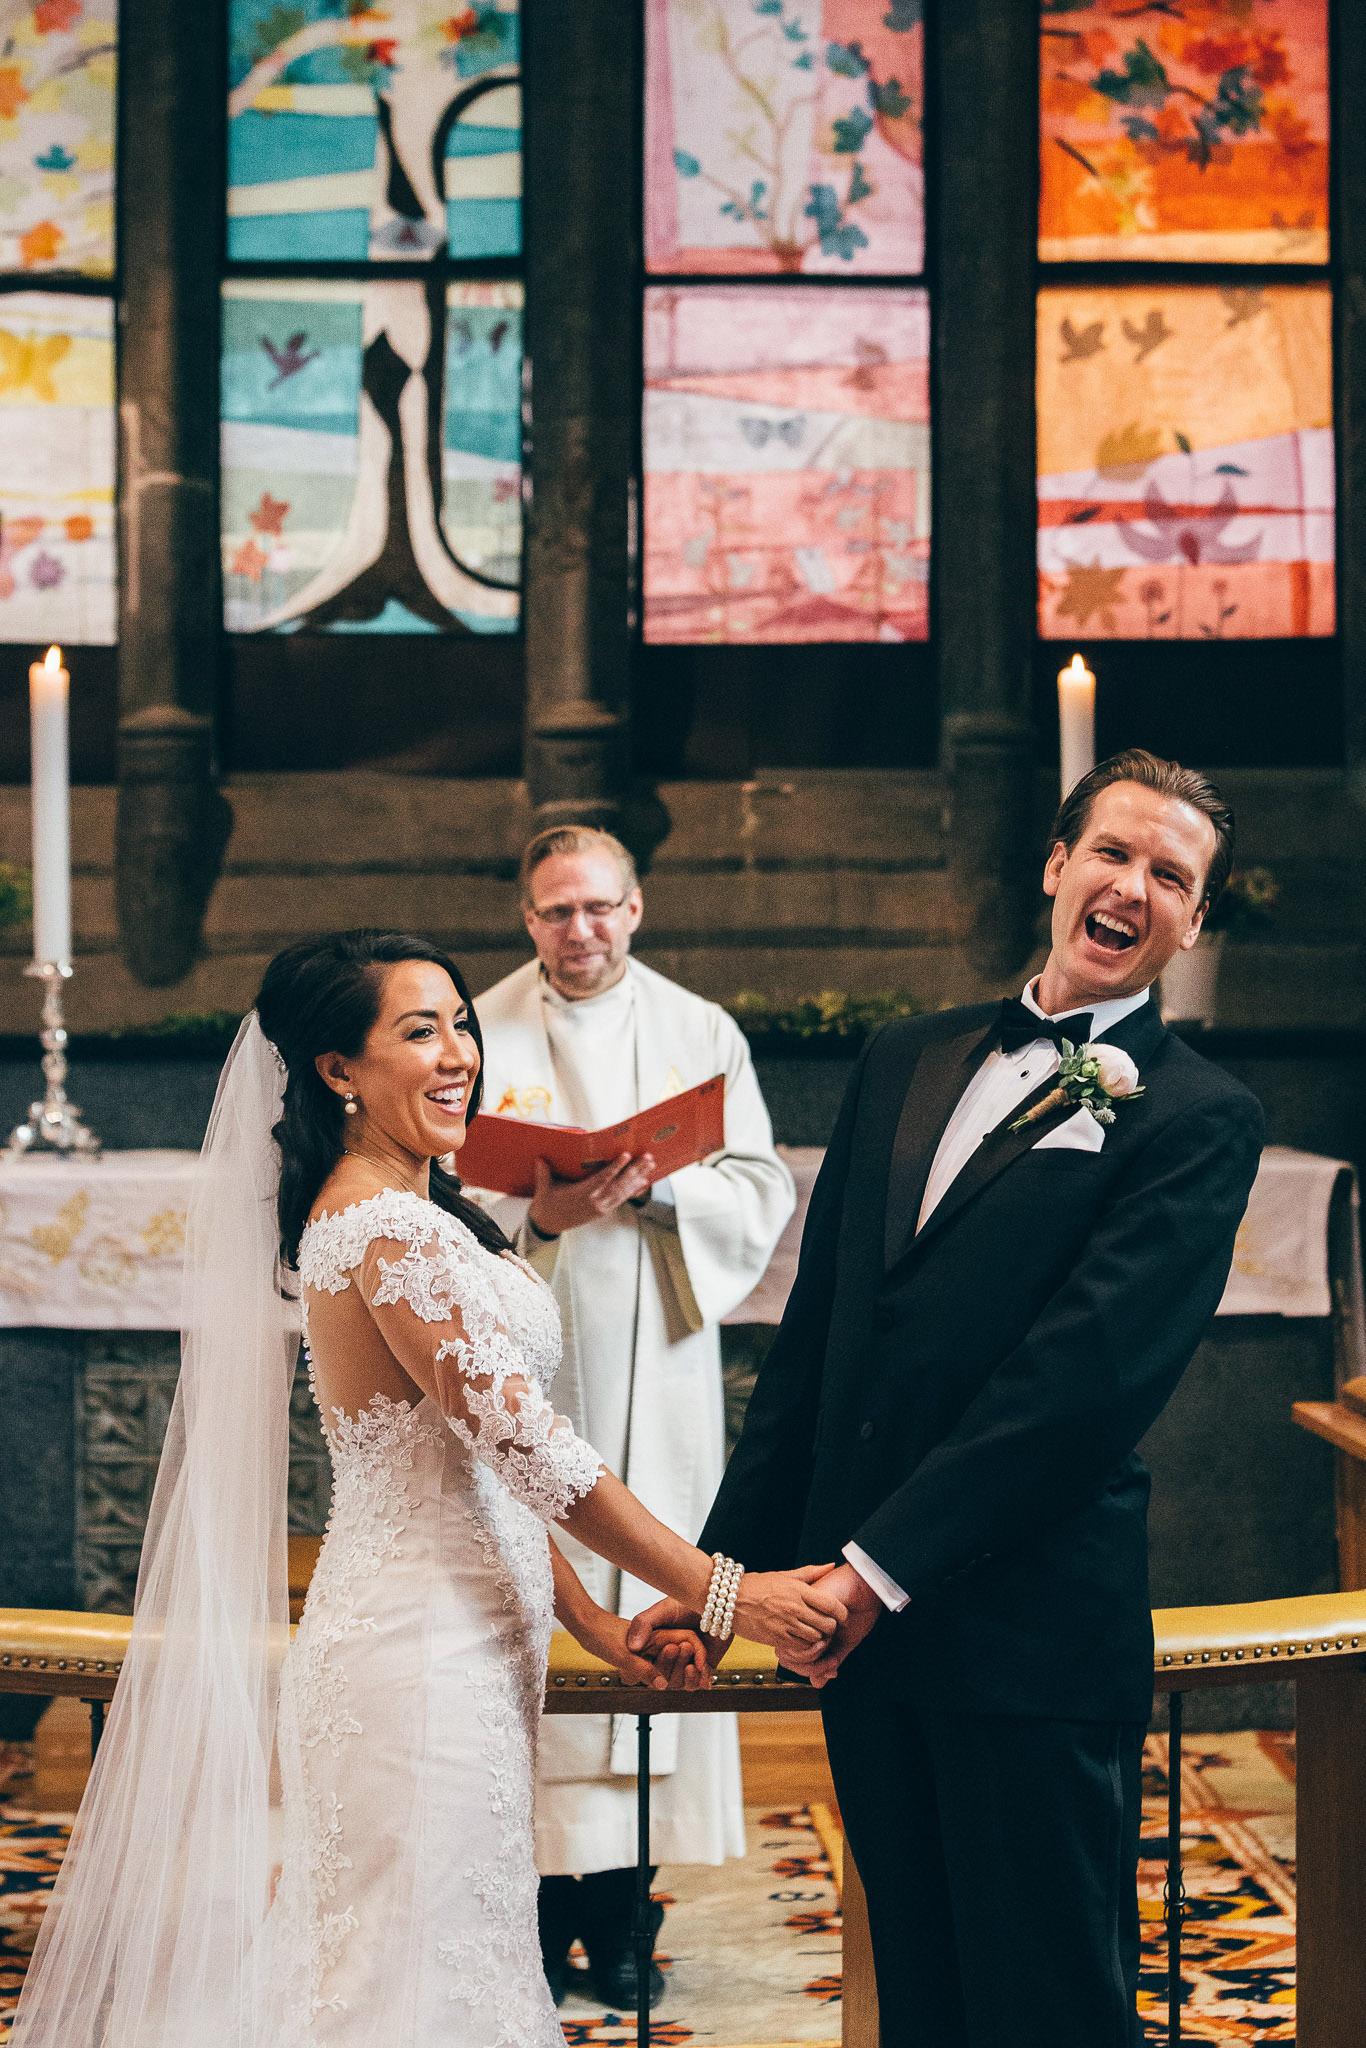 Wedding+Photographer+Norway+Bryllupsfotograf+Casey+Arneson+MK-129.jpg